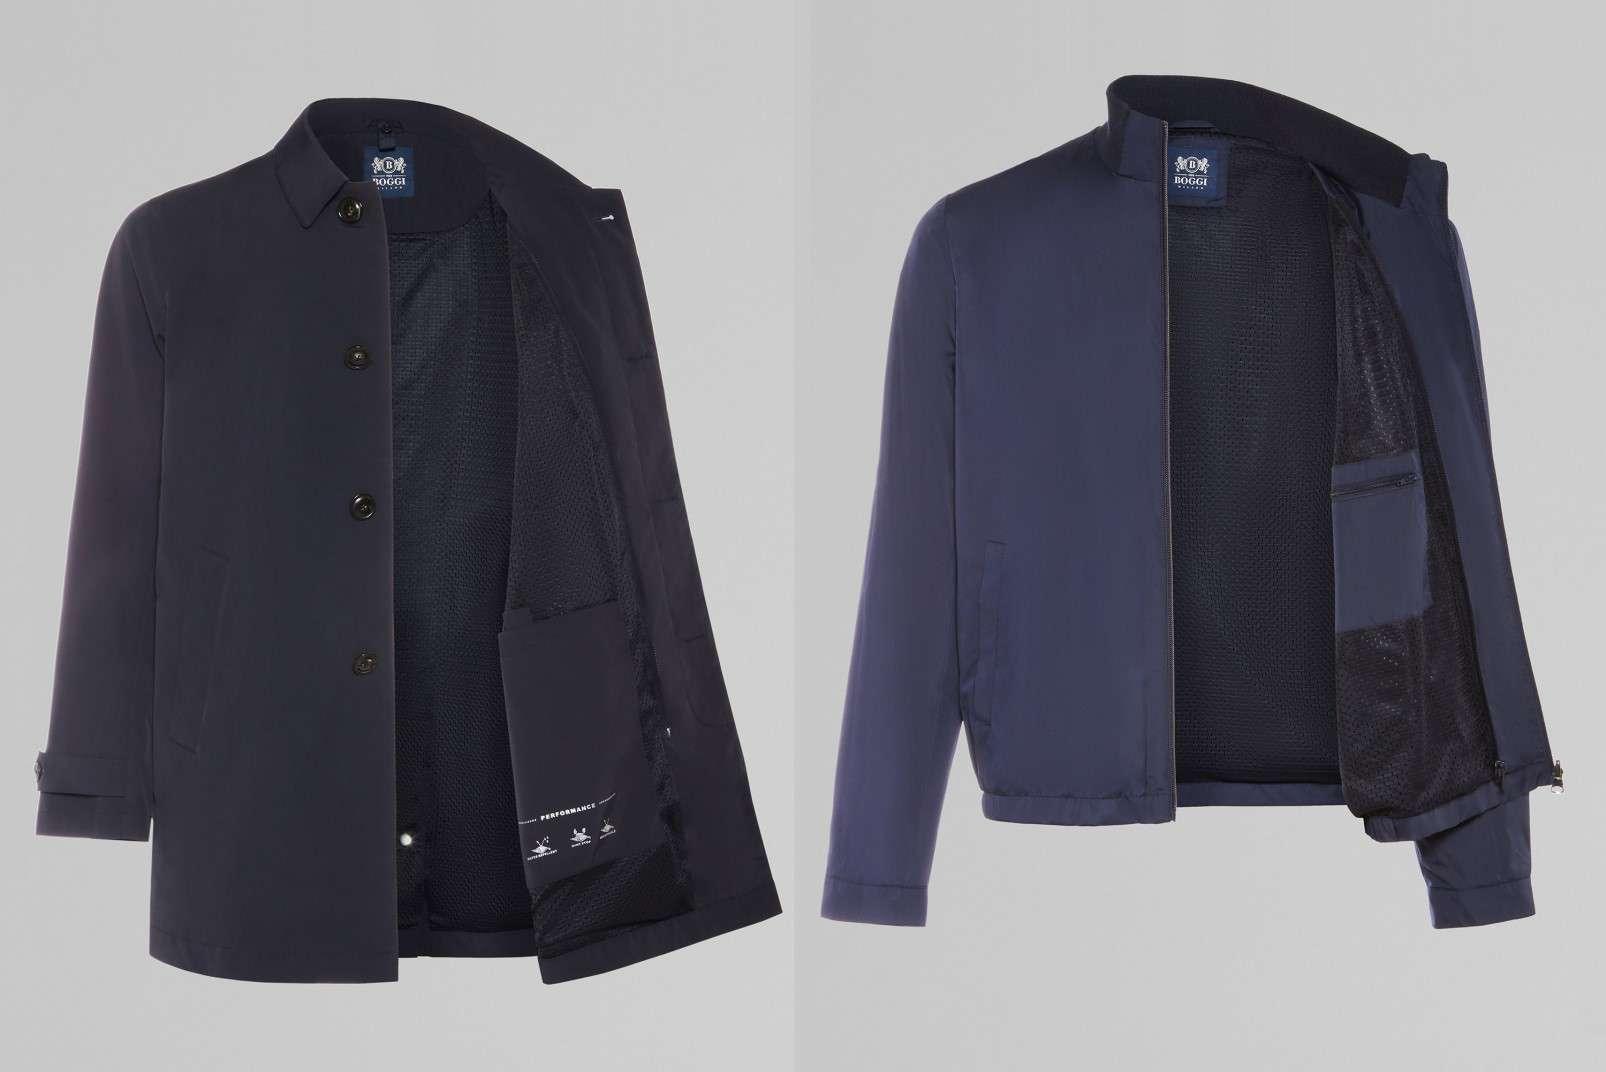 BO19P071201 Boggi Milano Travel Raincoat and internal Bomber Jacket-W1606